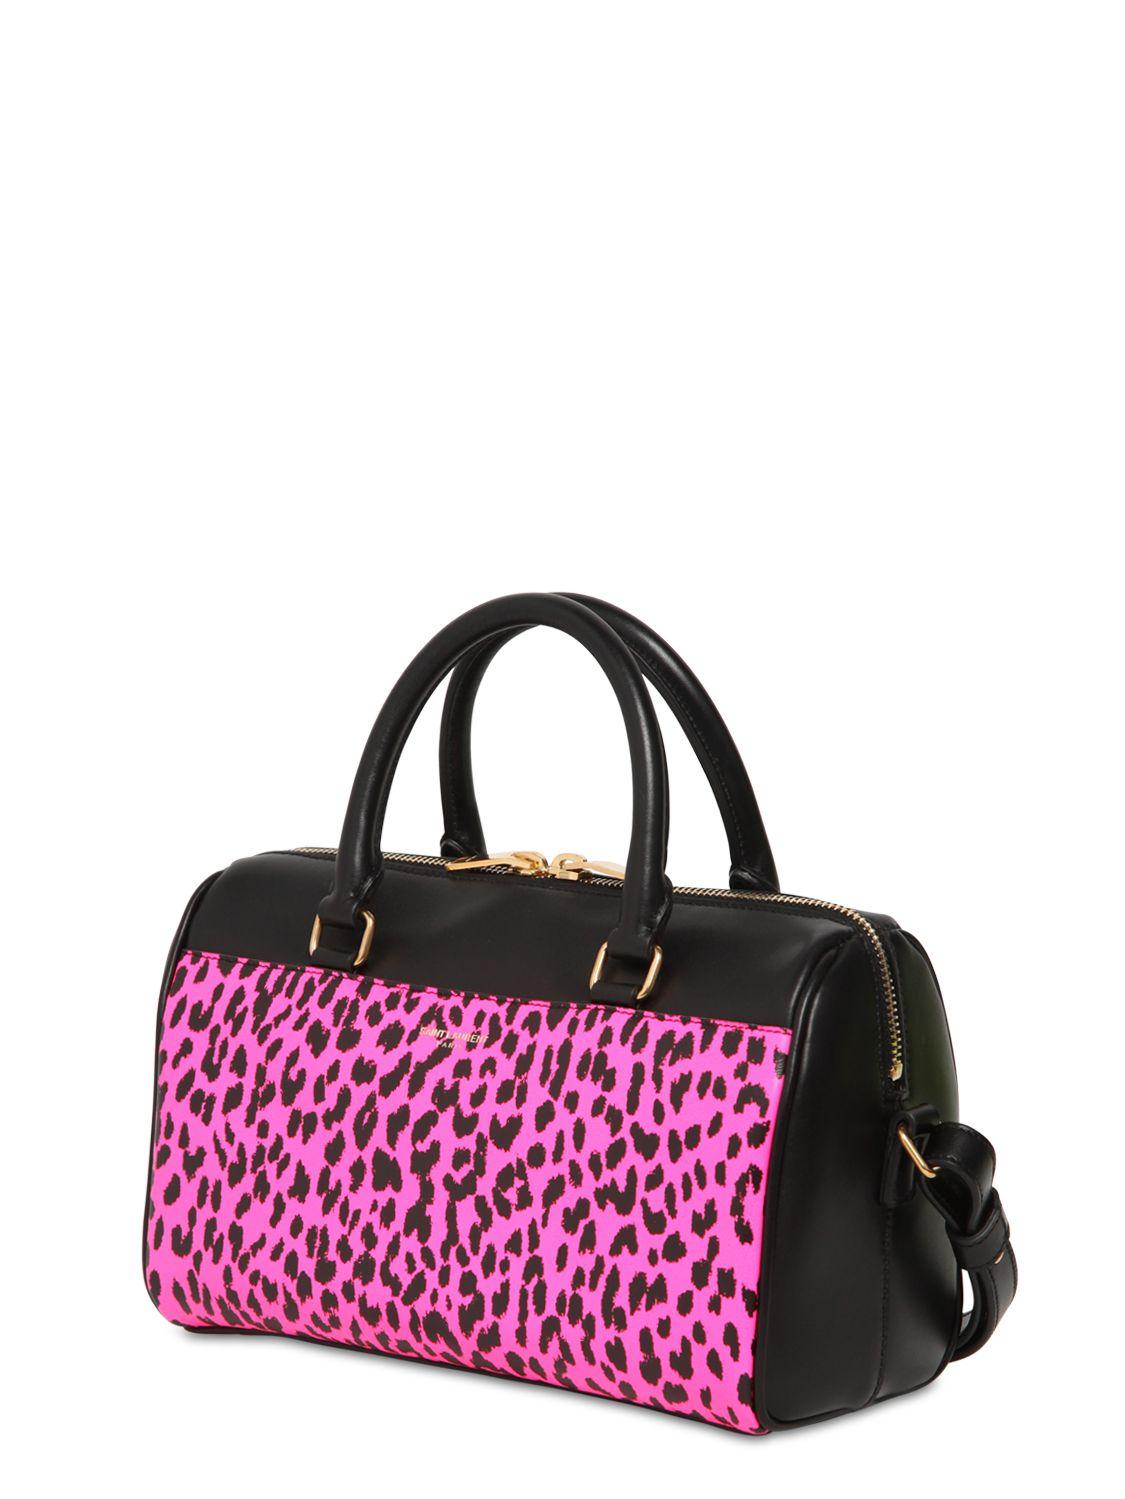 Lyst Saint Laurent Leopard Printed Leather Baby Duffle